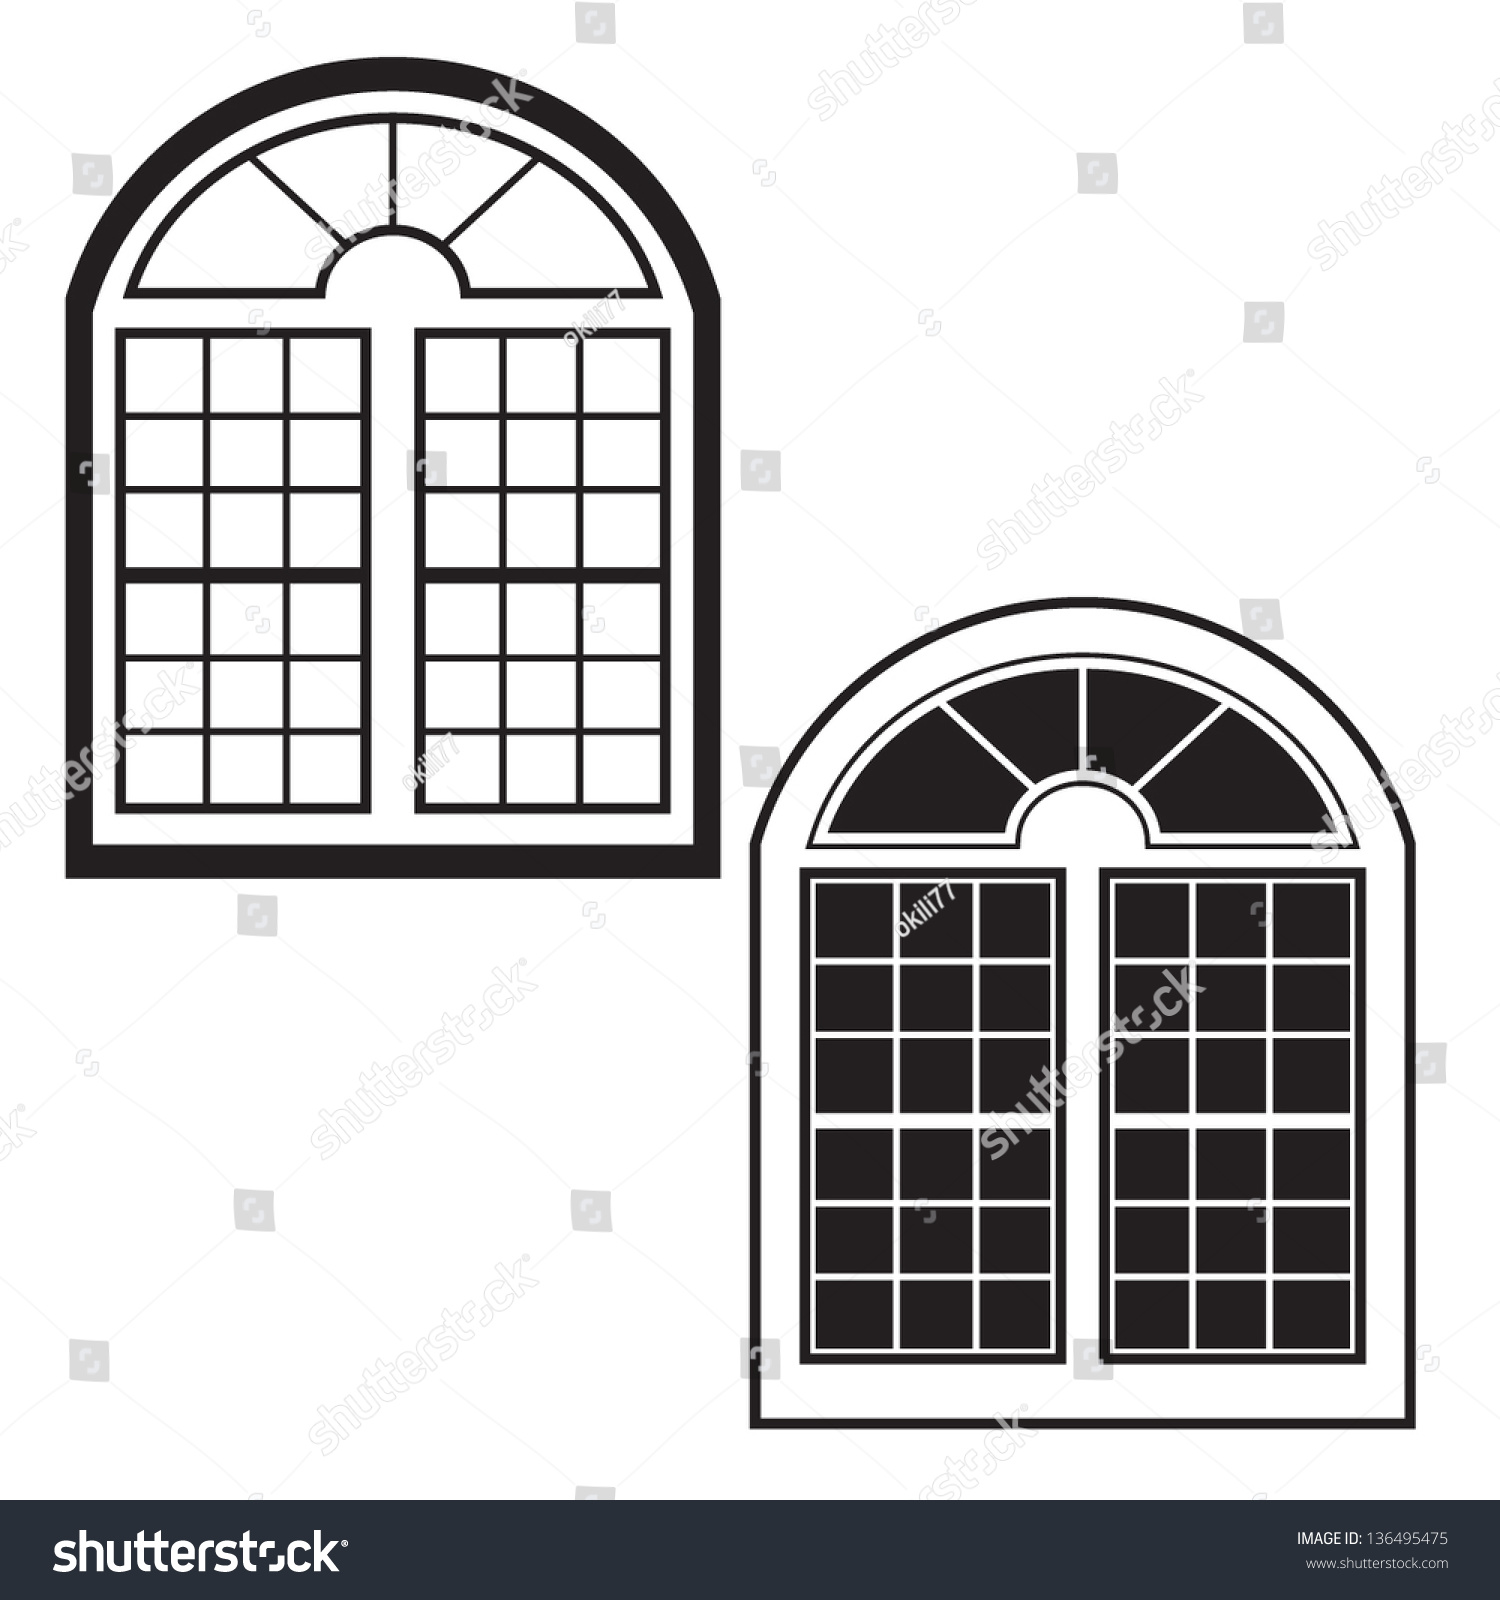 Window Silhouette Outline Vector Stock Vector 136495475